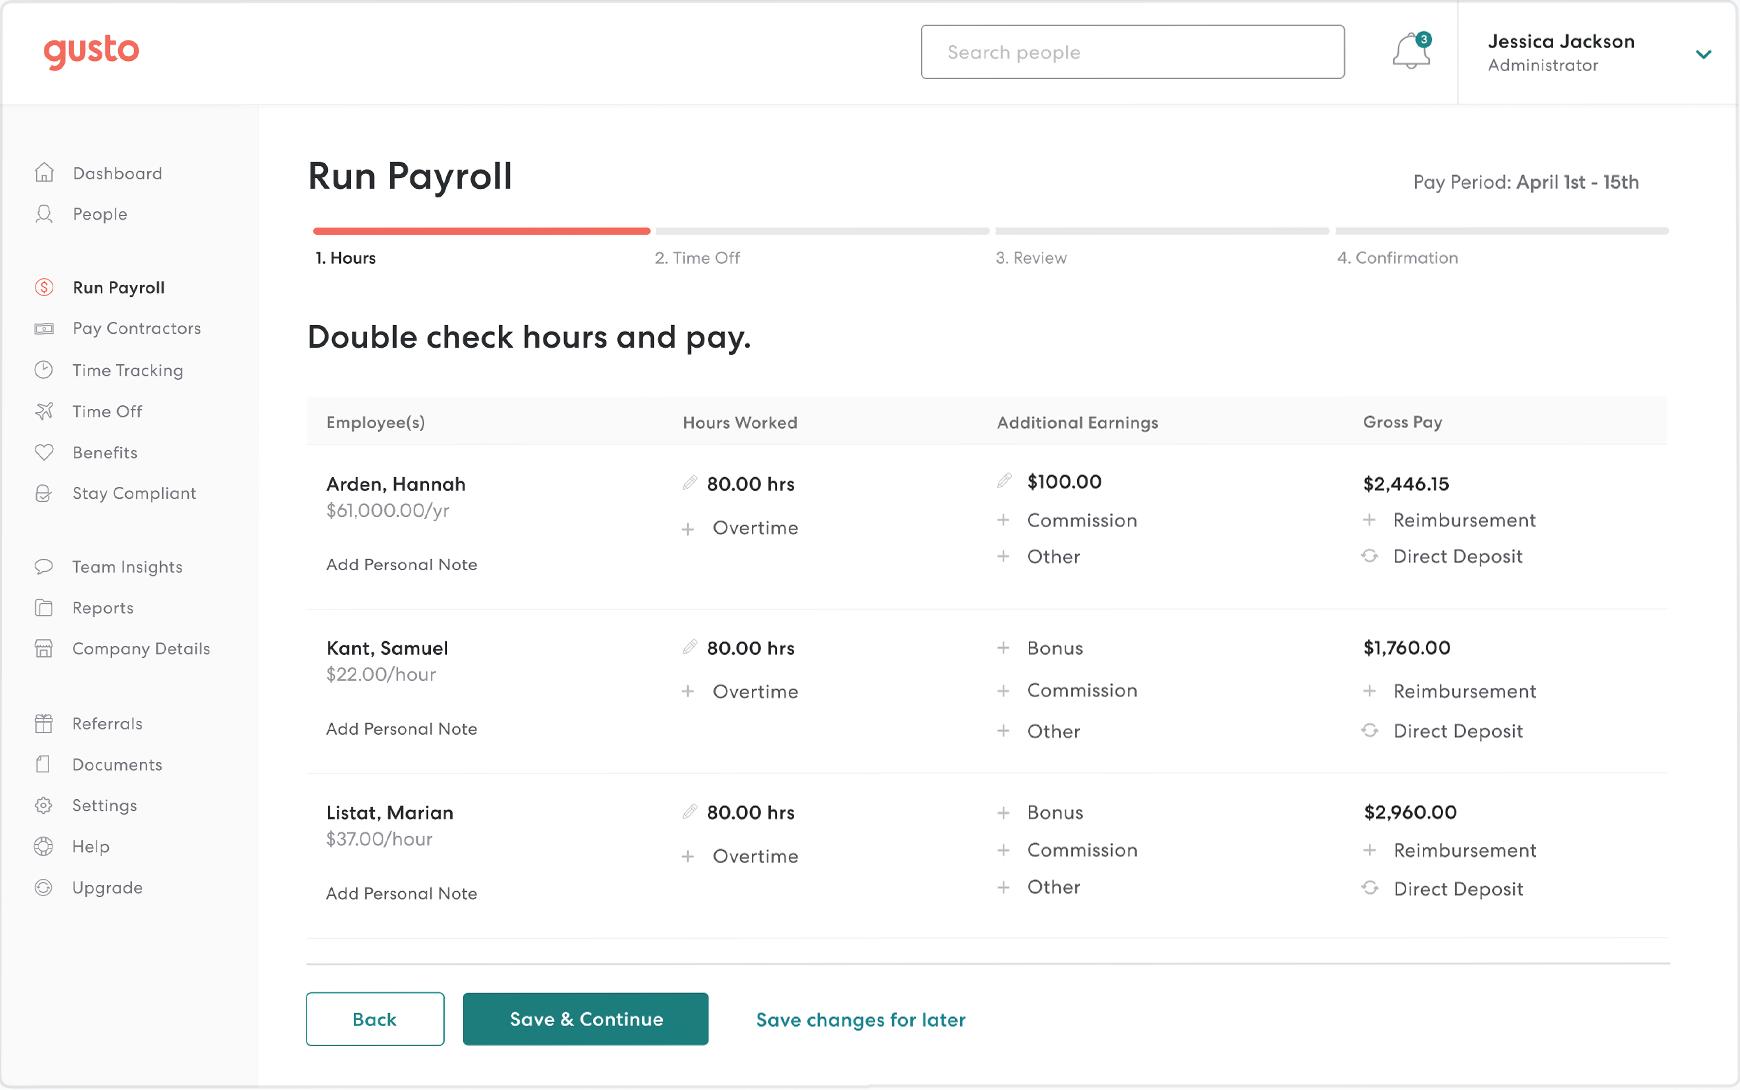 Gusto run payroll